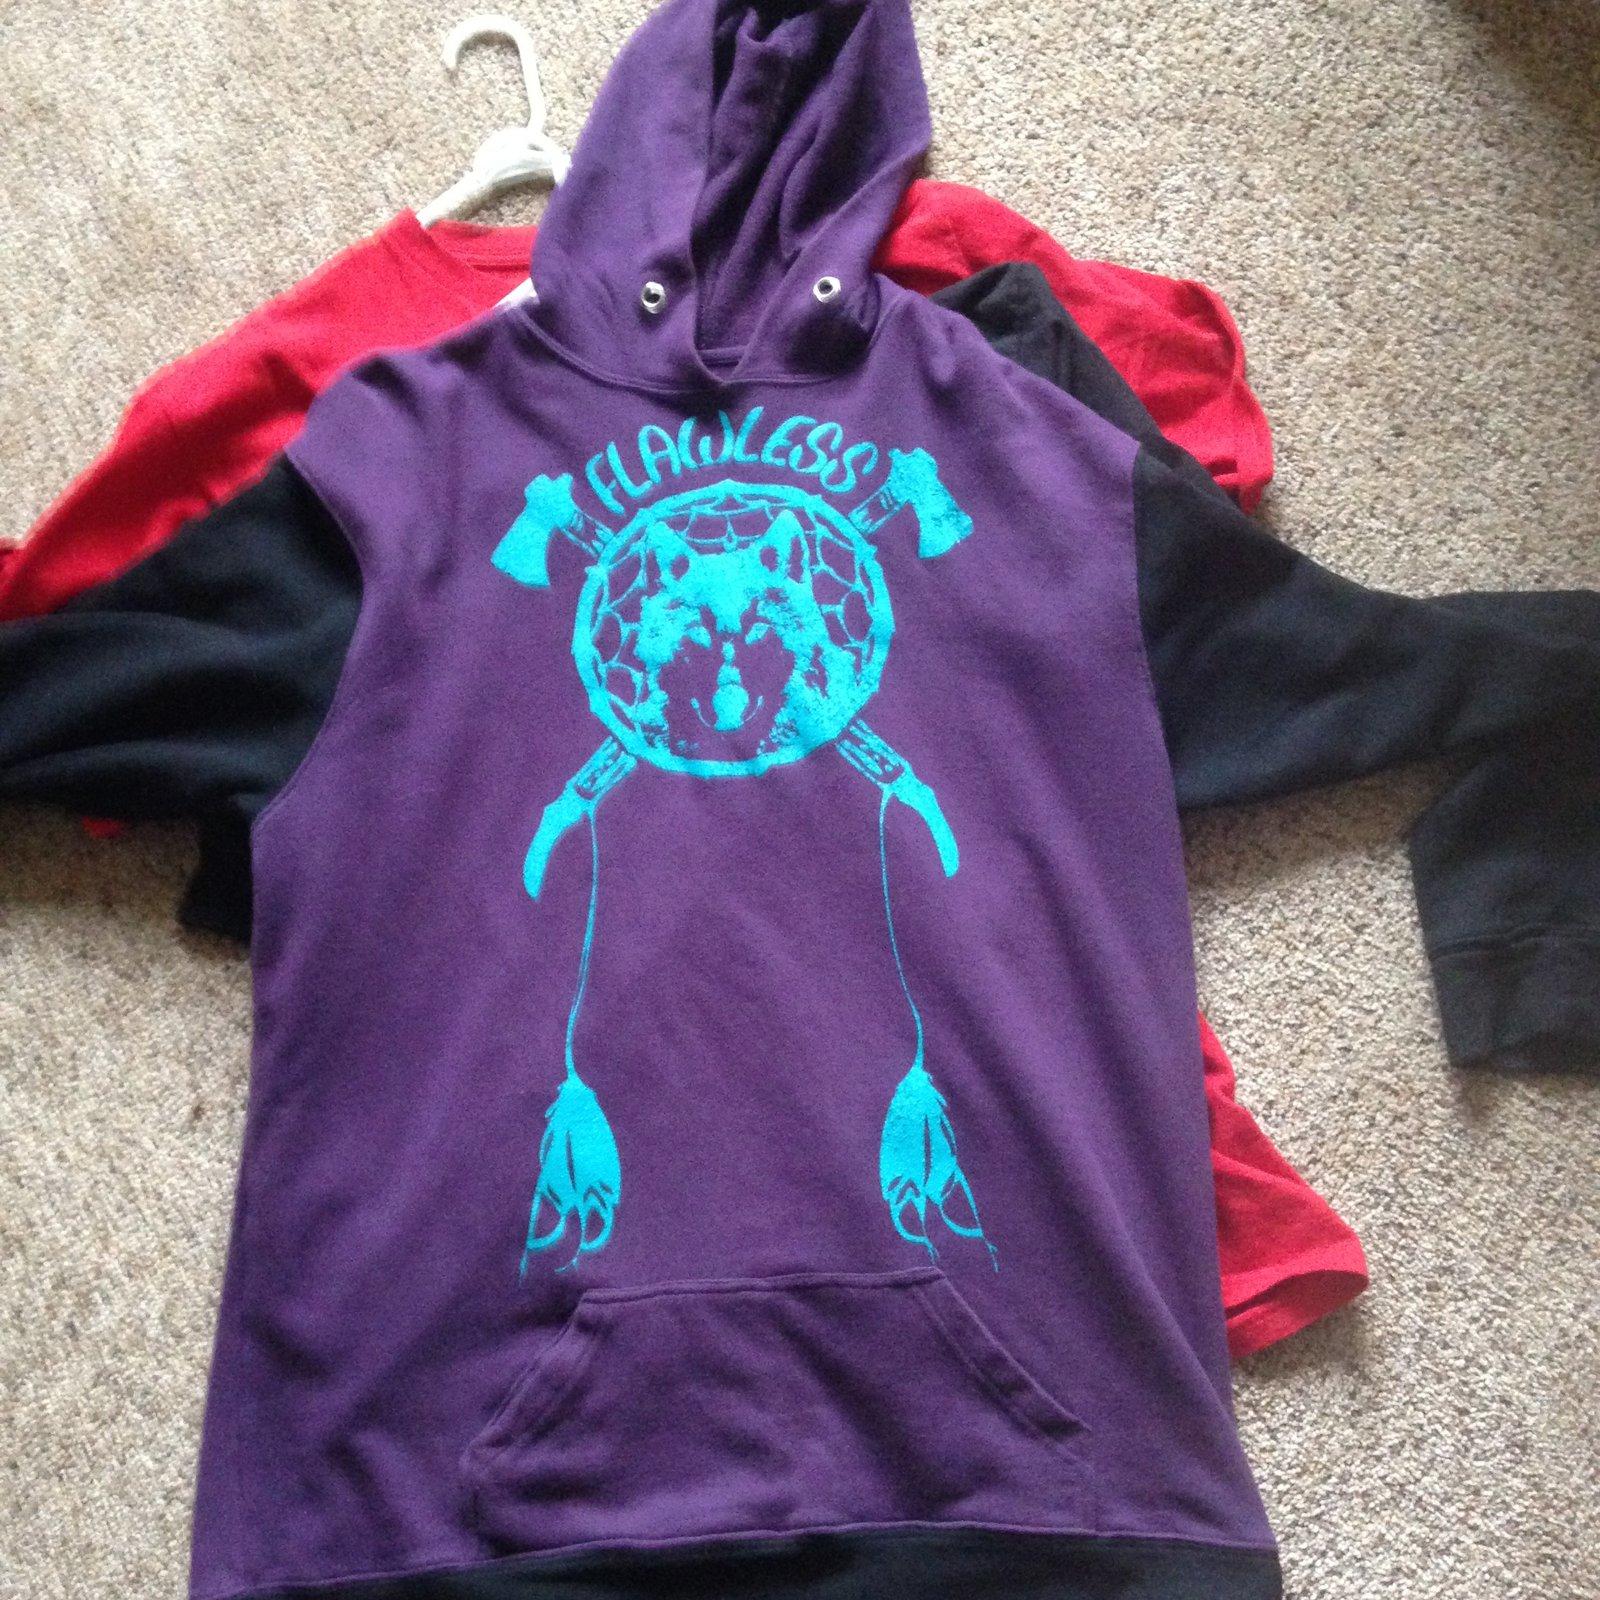 flawless 2xl hoodie new sale thread